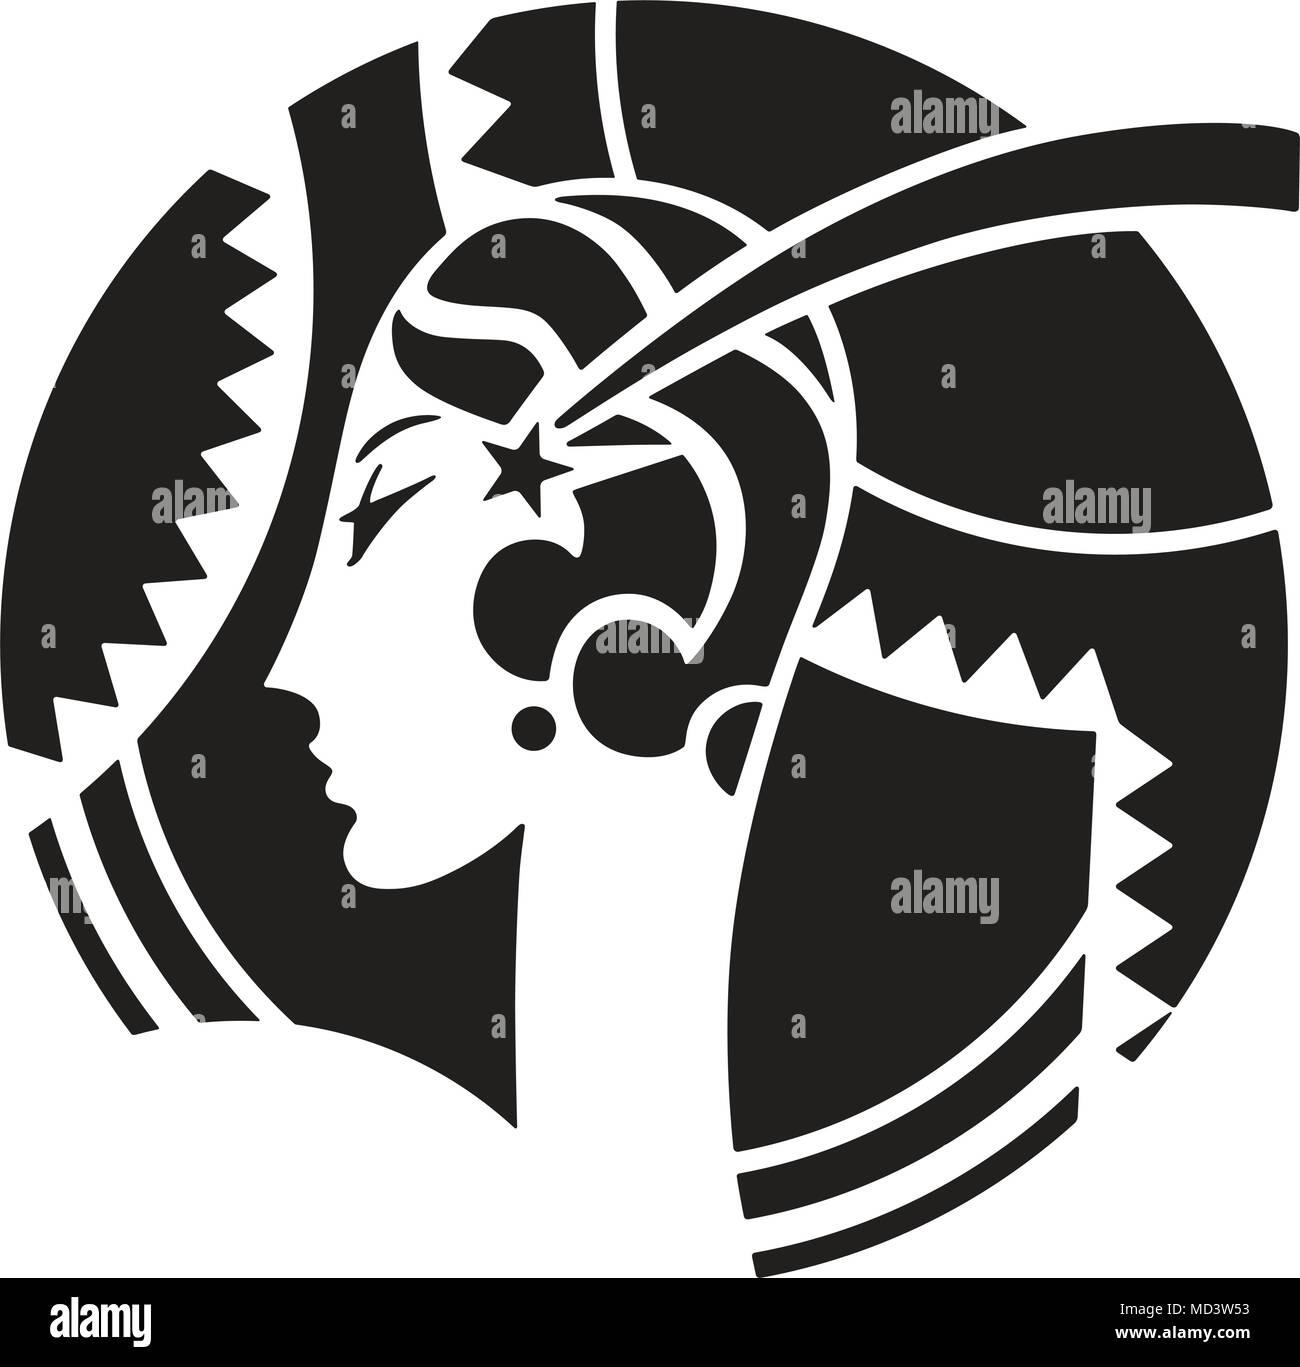 Art Deco Motif - Retro Clipart Illustration Stock Vector Art ...